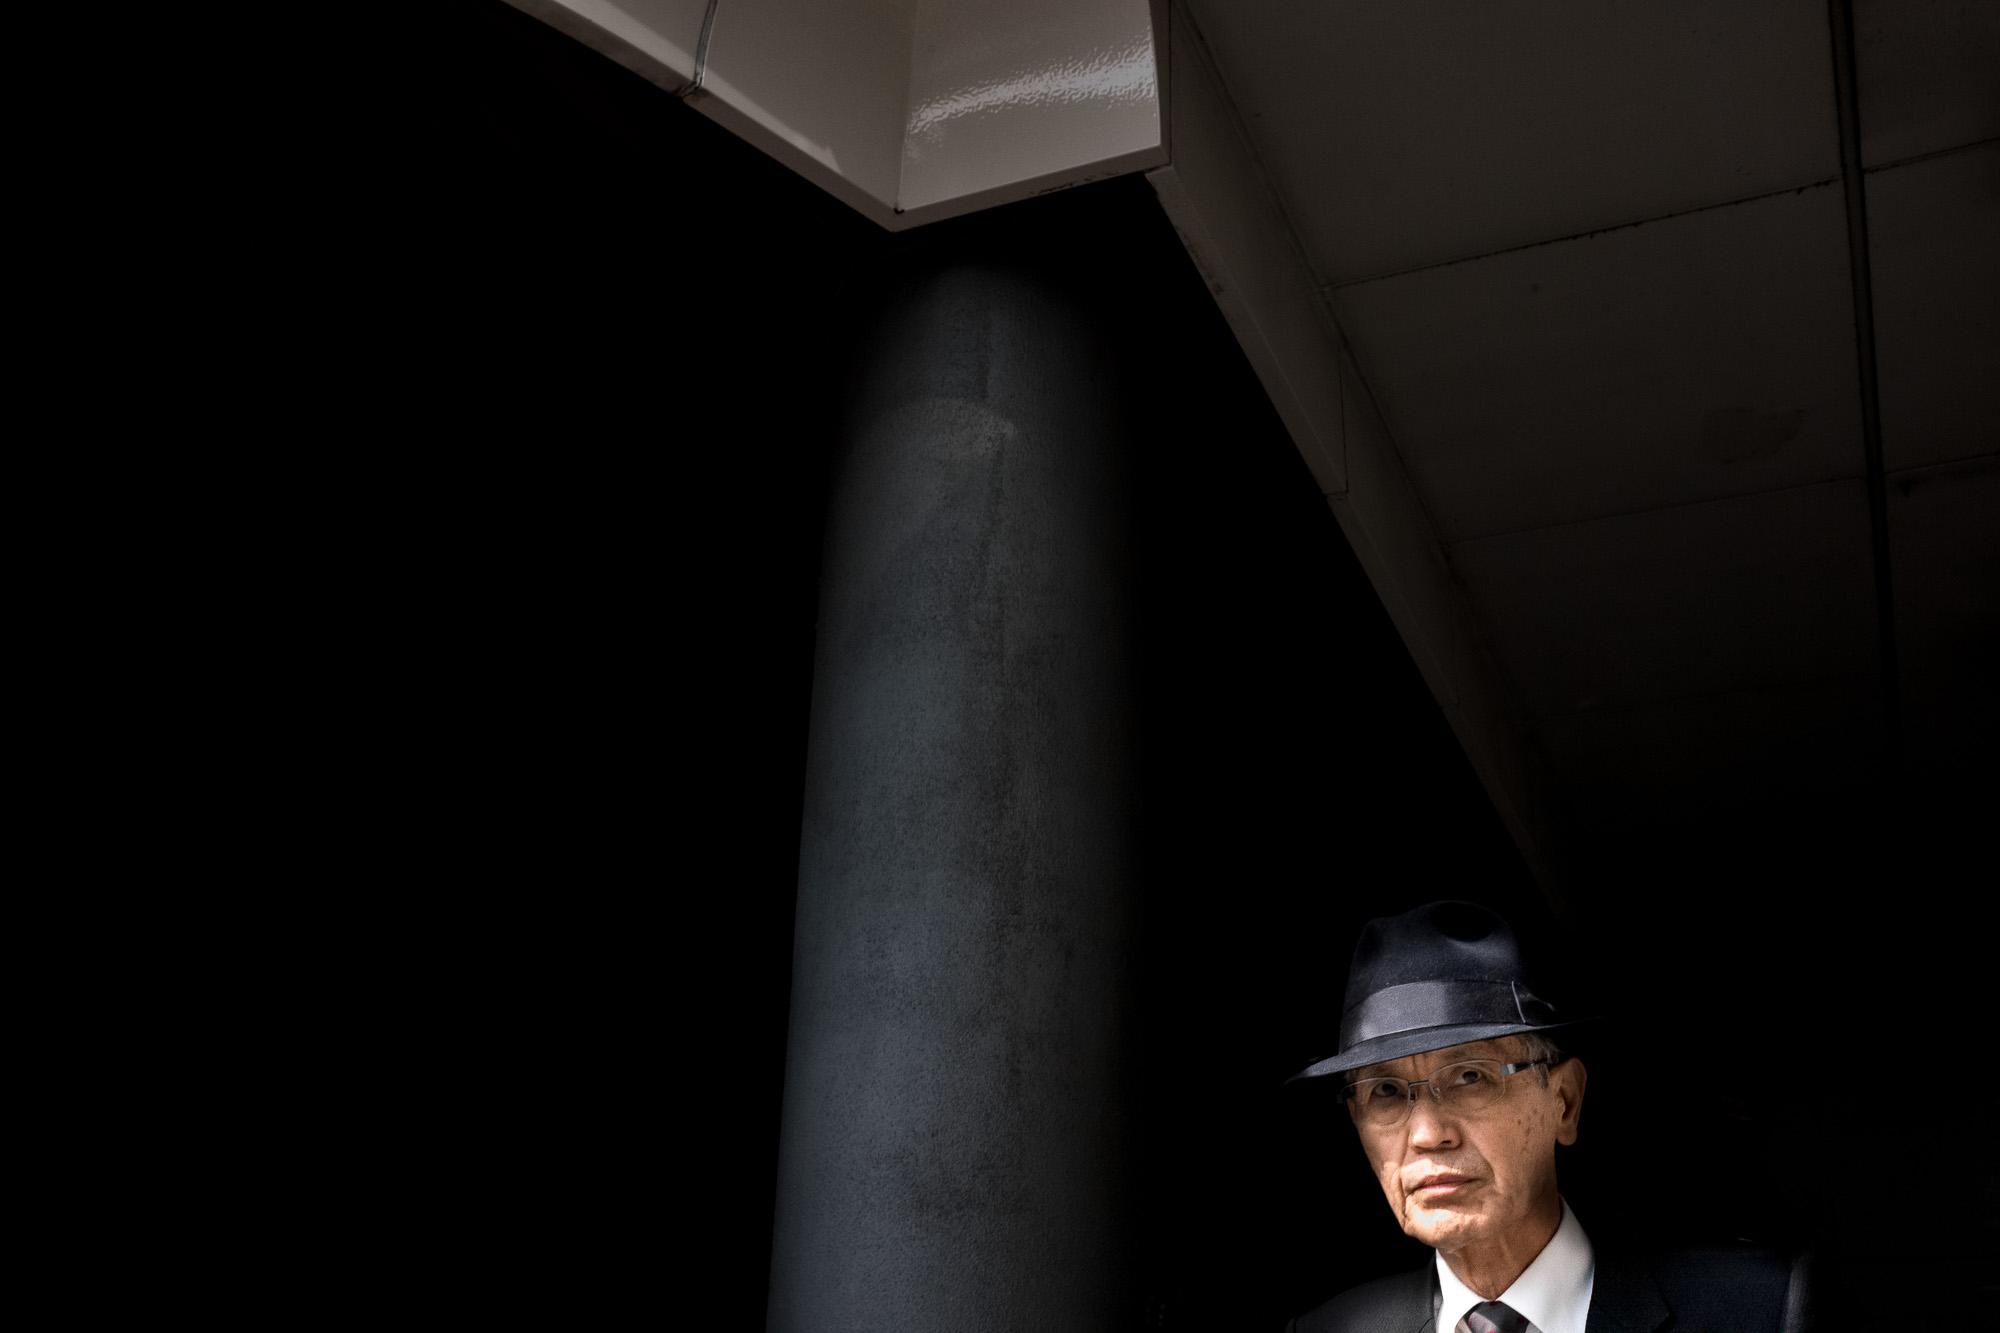 tokyo-salaryman-emerging-from-the-shadows-2000.jpg